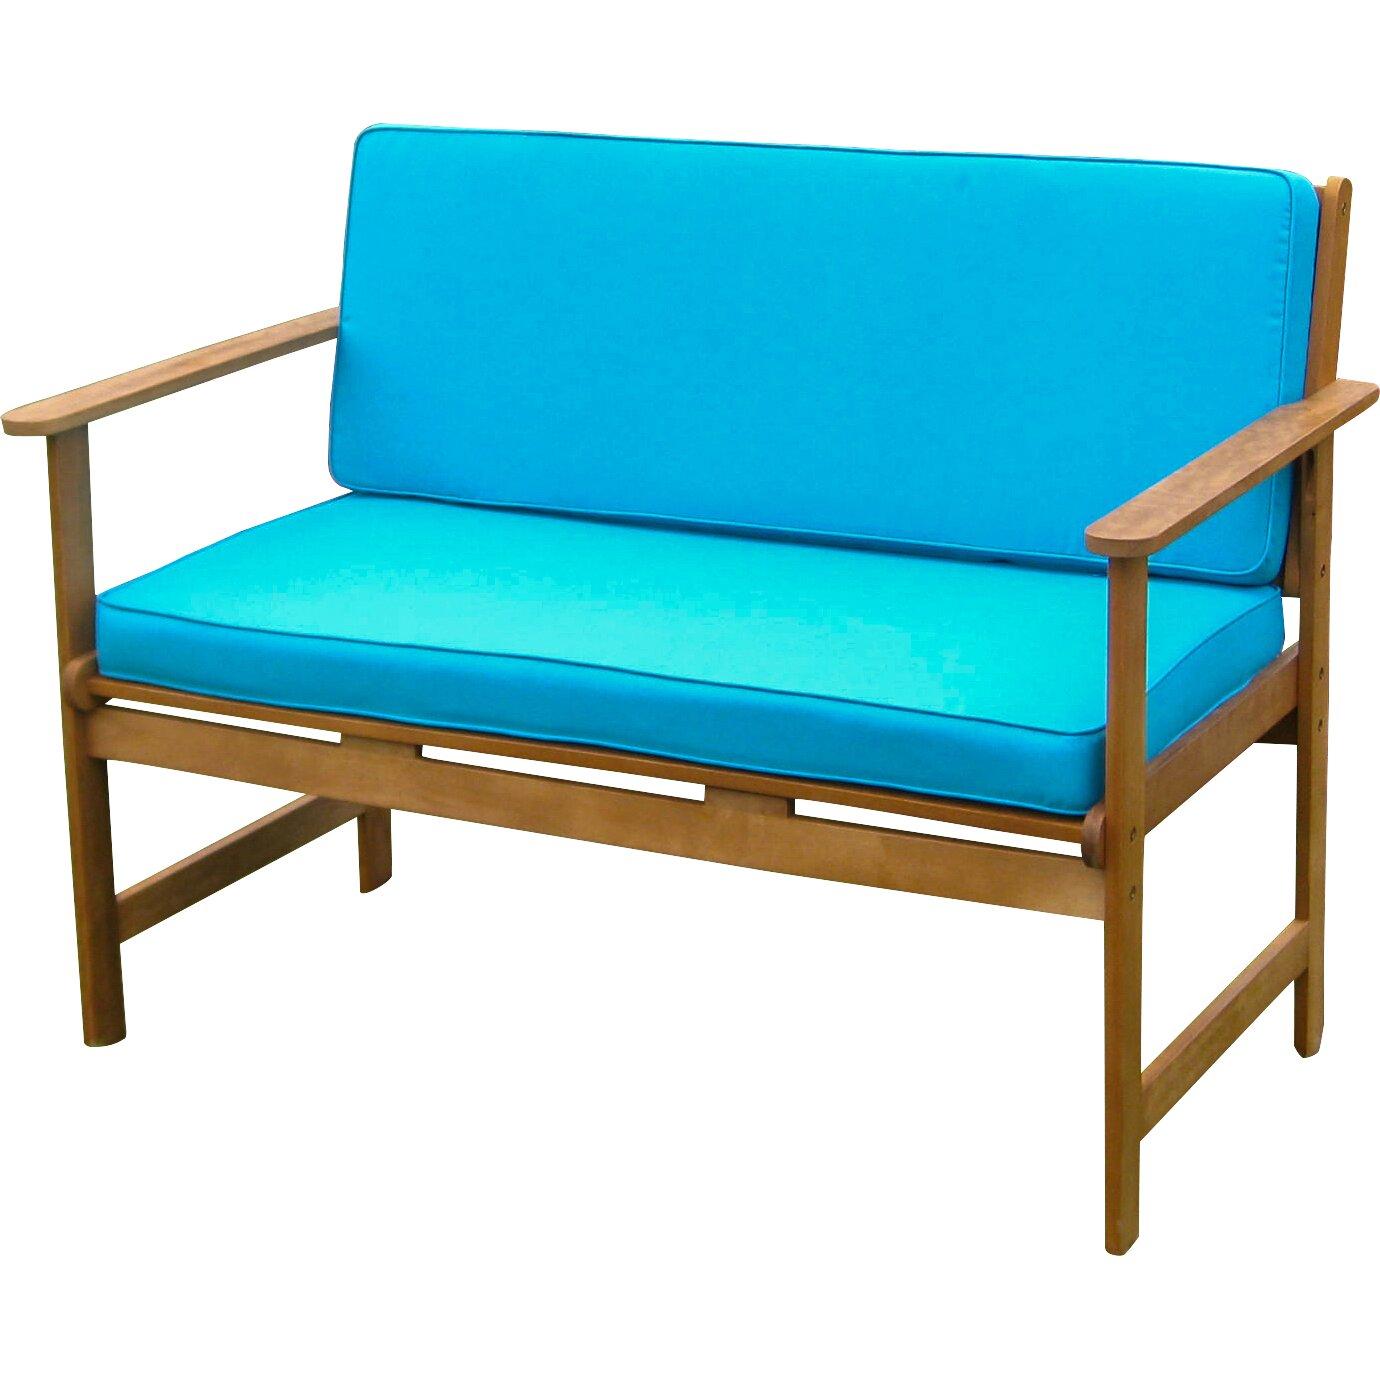 Breakwater Bay Sabbattus Wood Garden Bench with Cushions